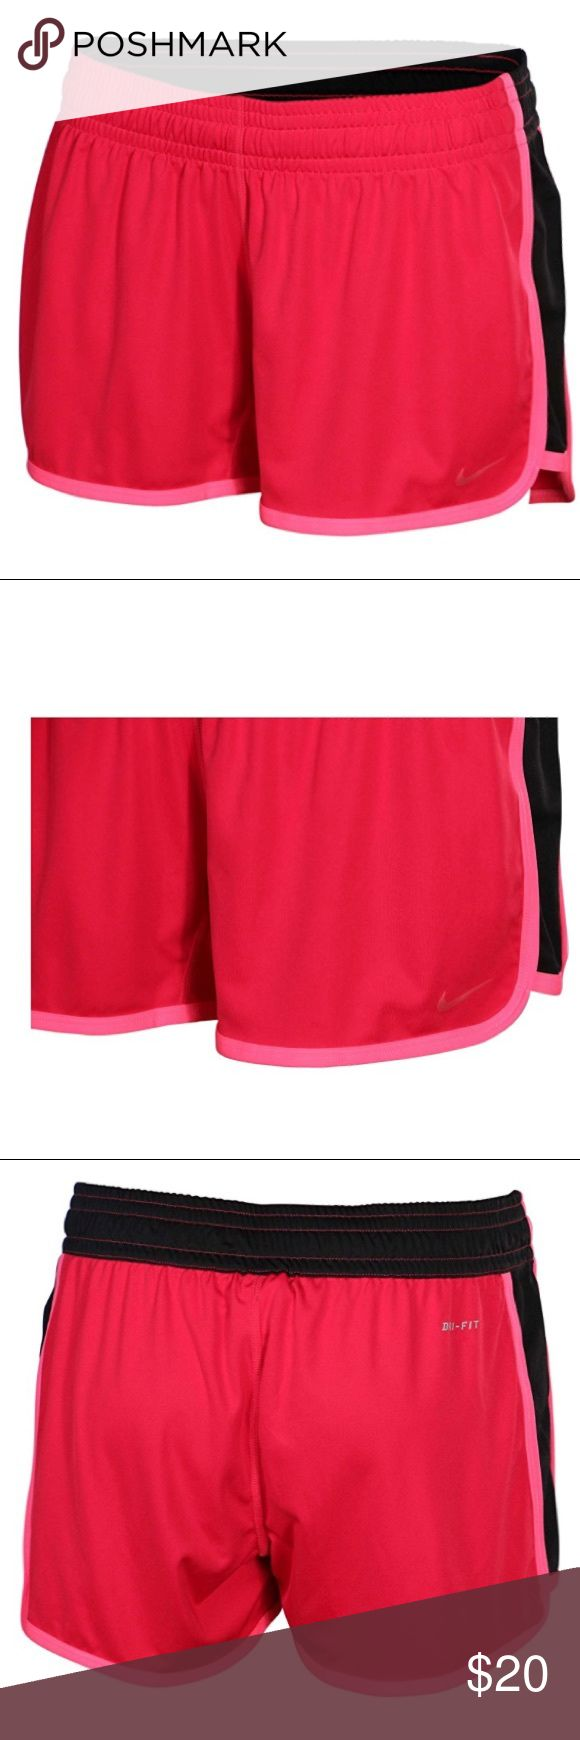 Nike Dri-Fit 3.5 Fly Knit Training Shorts-Magenta Nike Women's Dri-Fit 3.5 Fly Knit Training Shorts-Magenta-Small Nike Shorts